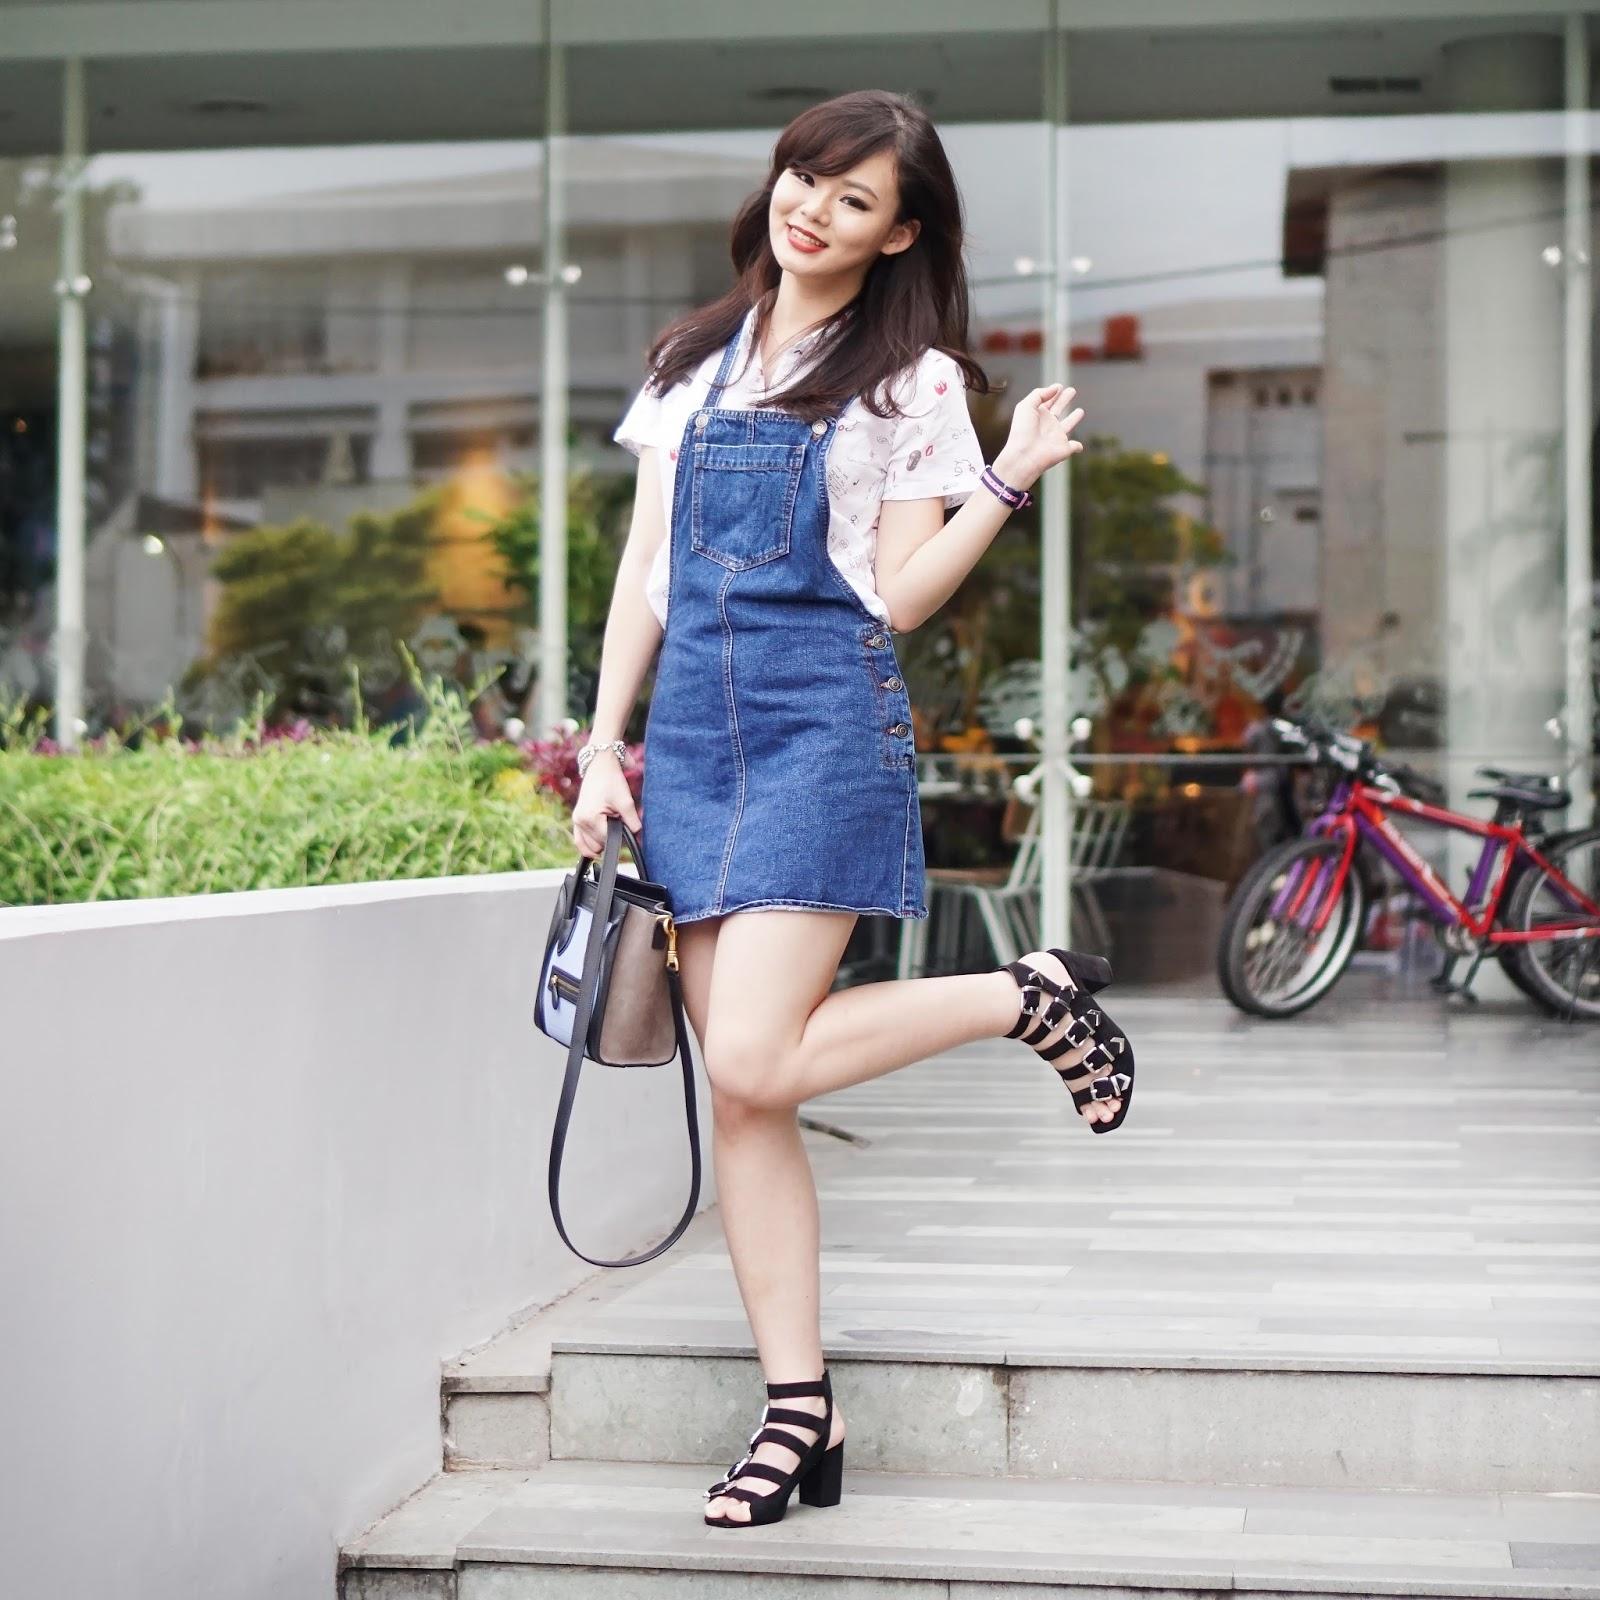 haid, menstruasi, datang bulan, perempuan, wanita, ootd, jean milka ootd, jeanmilkaootd, fashion, style, lifestyle, fashion blogger, indonesian fashion blogger